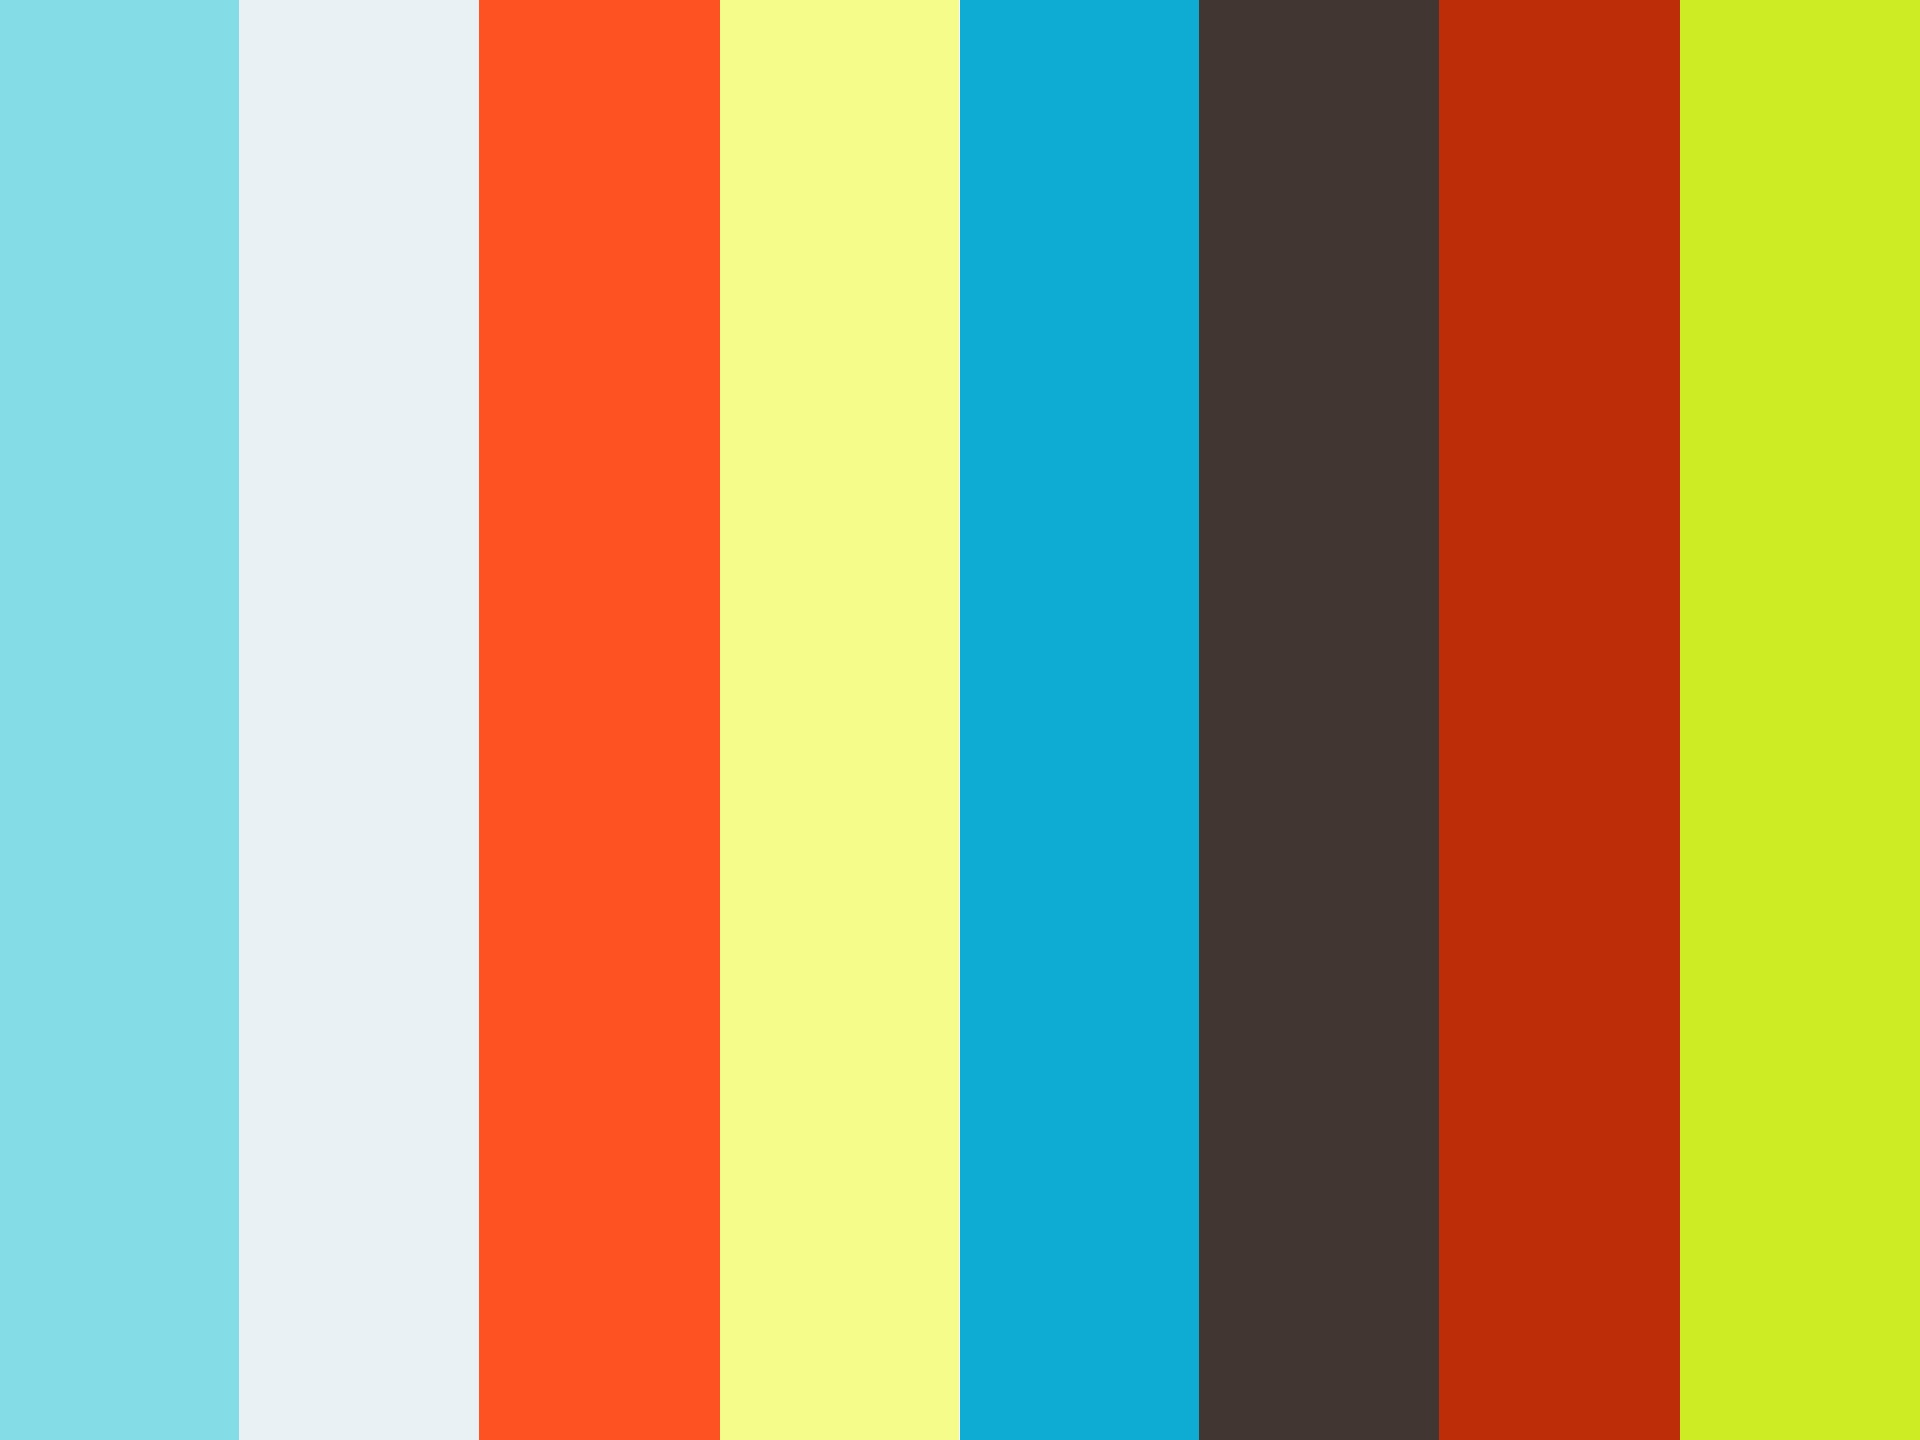 Sterling - HTML Web Template - 2. Files + Folders on Vimeo